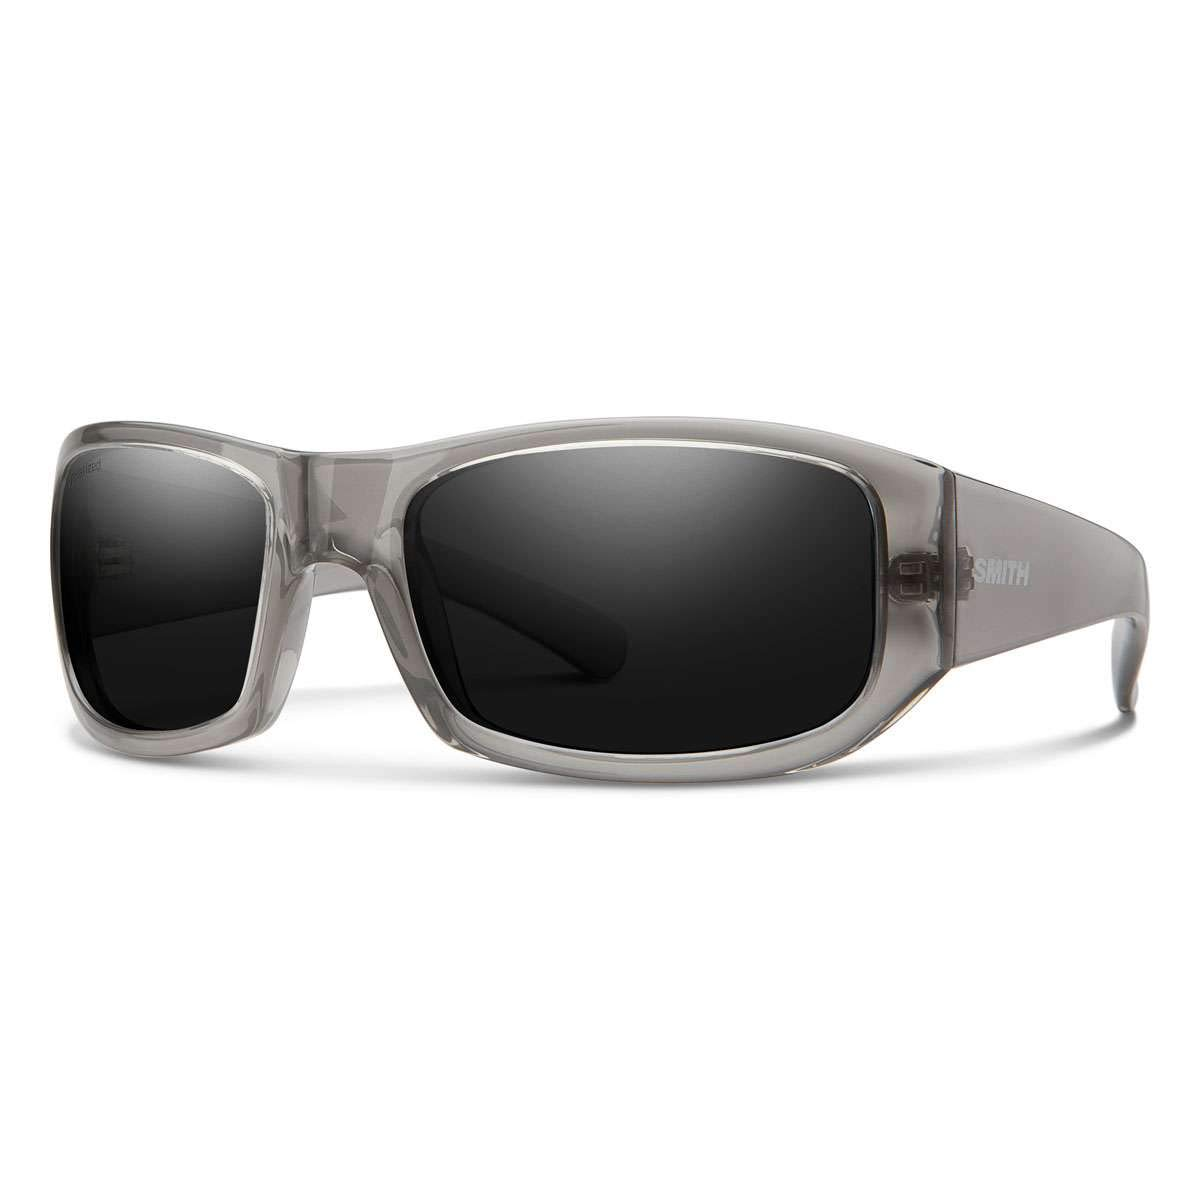 Smith Bauhaus Sunglasses Smith Optics 20193008654SP